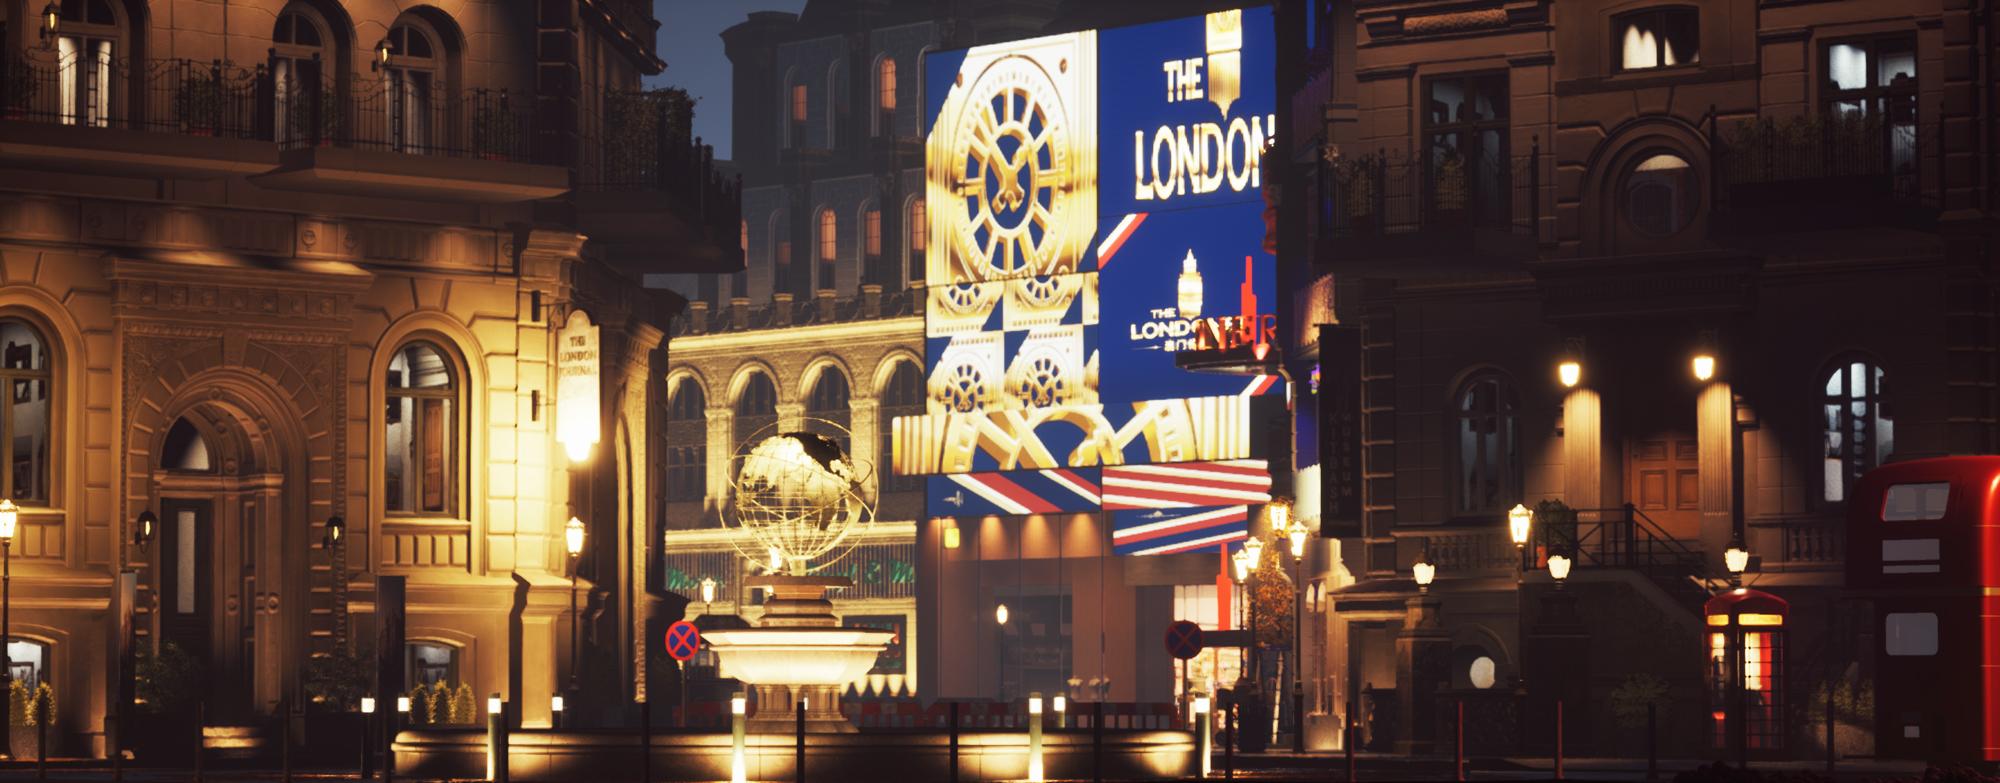 Londoner Night 5